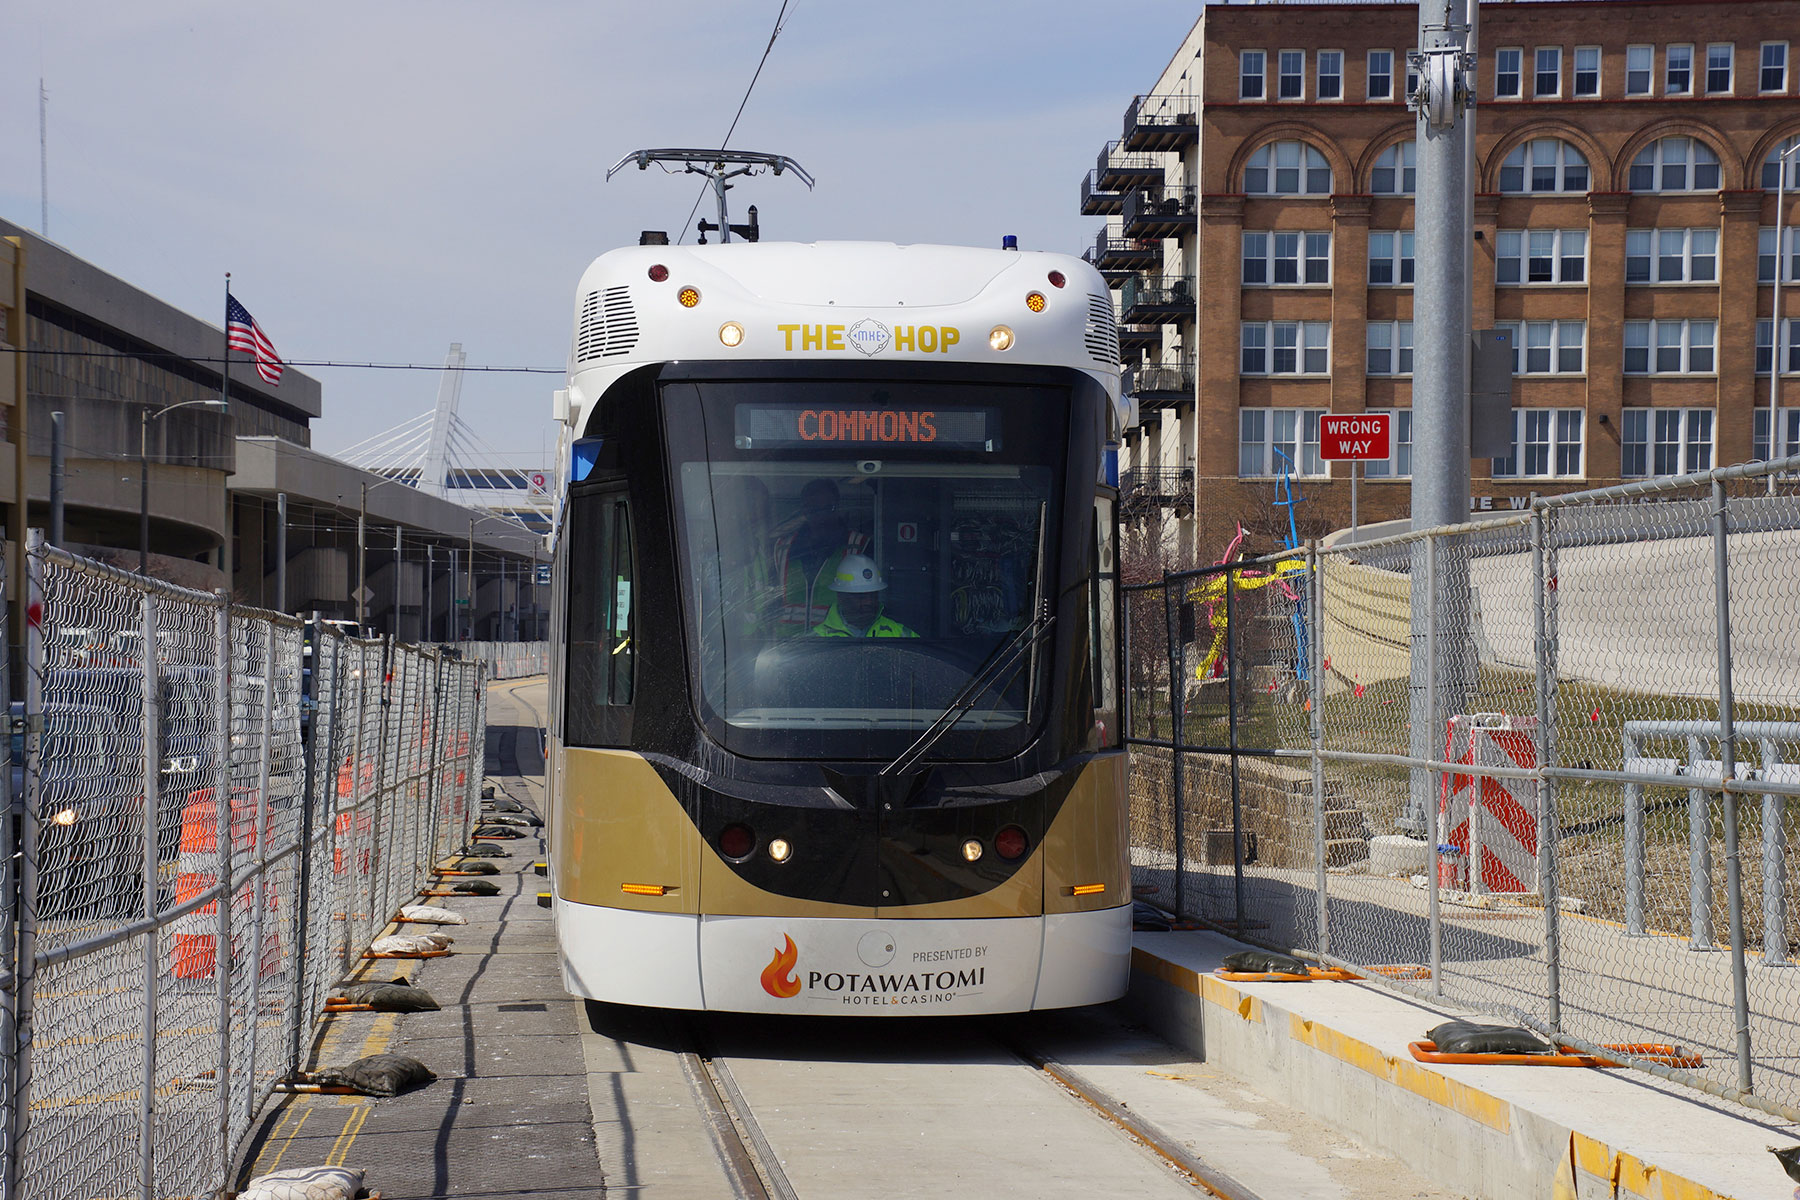 041118_streetcartesting_286